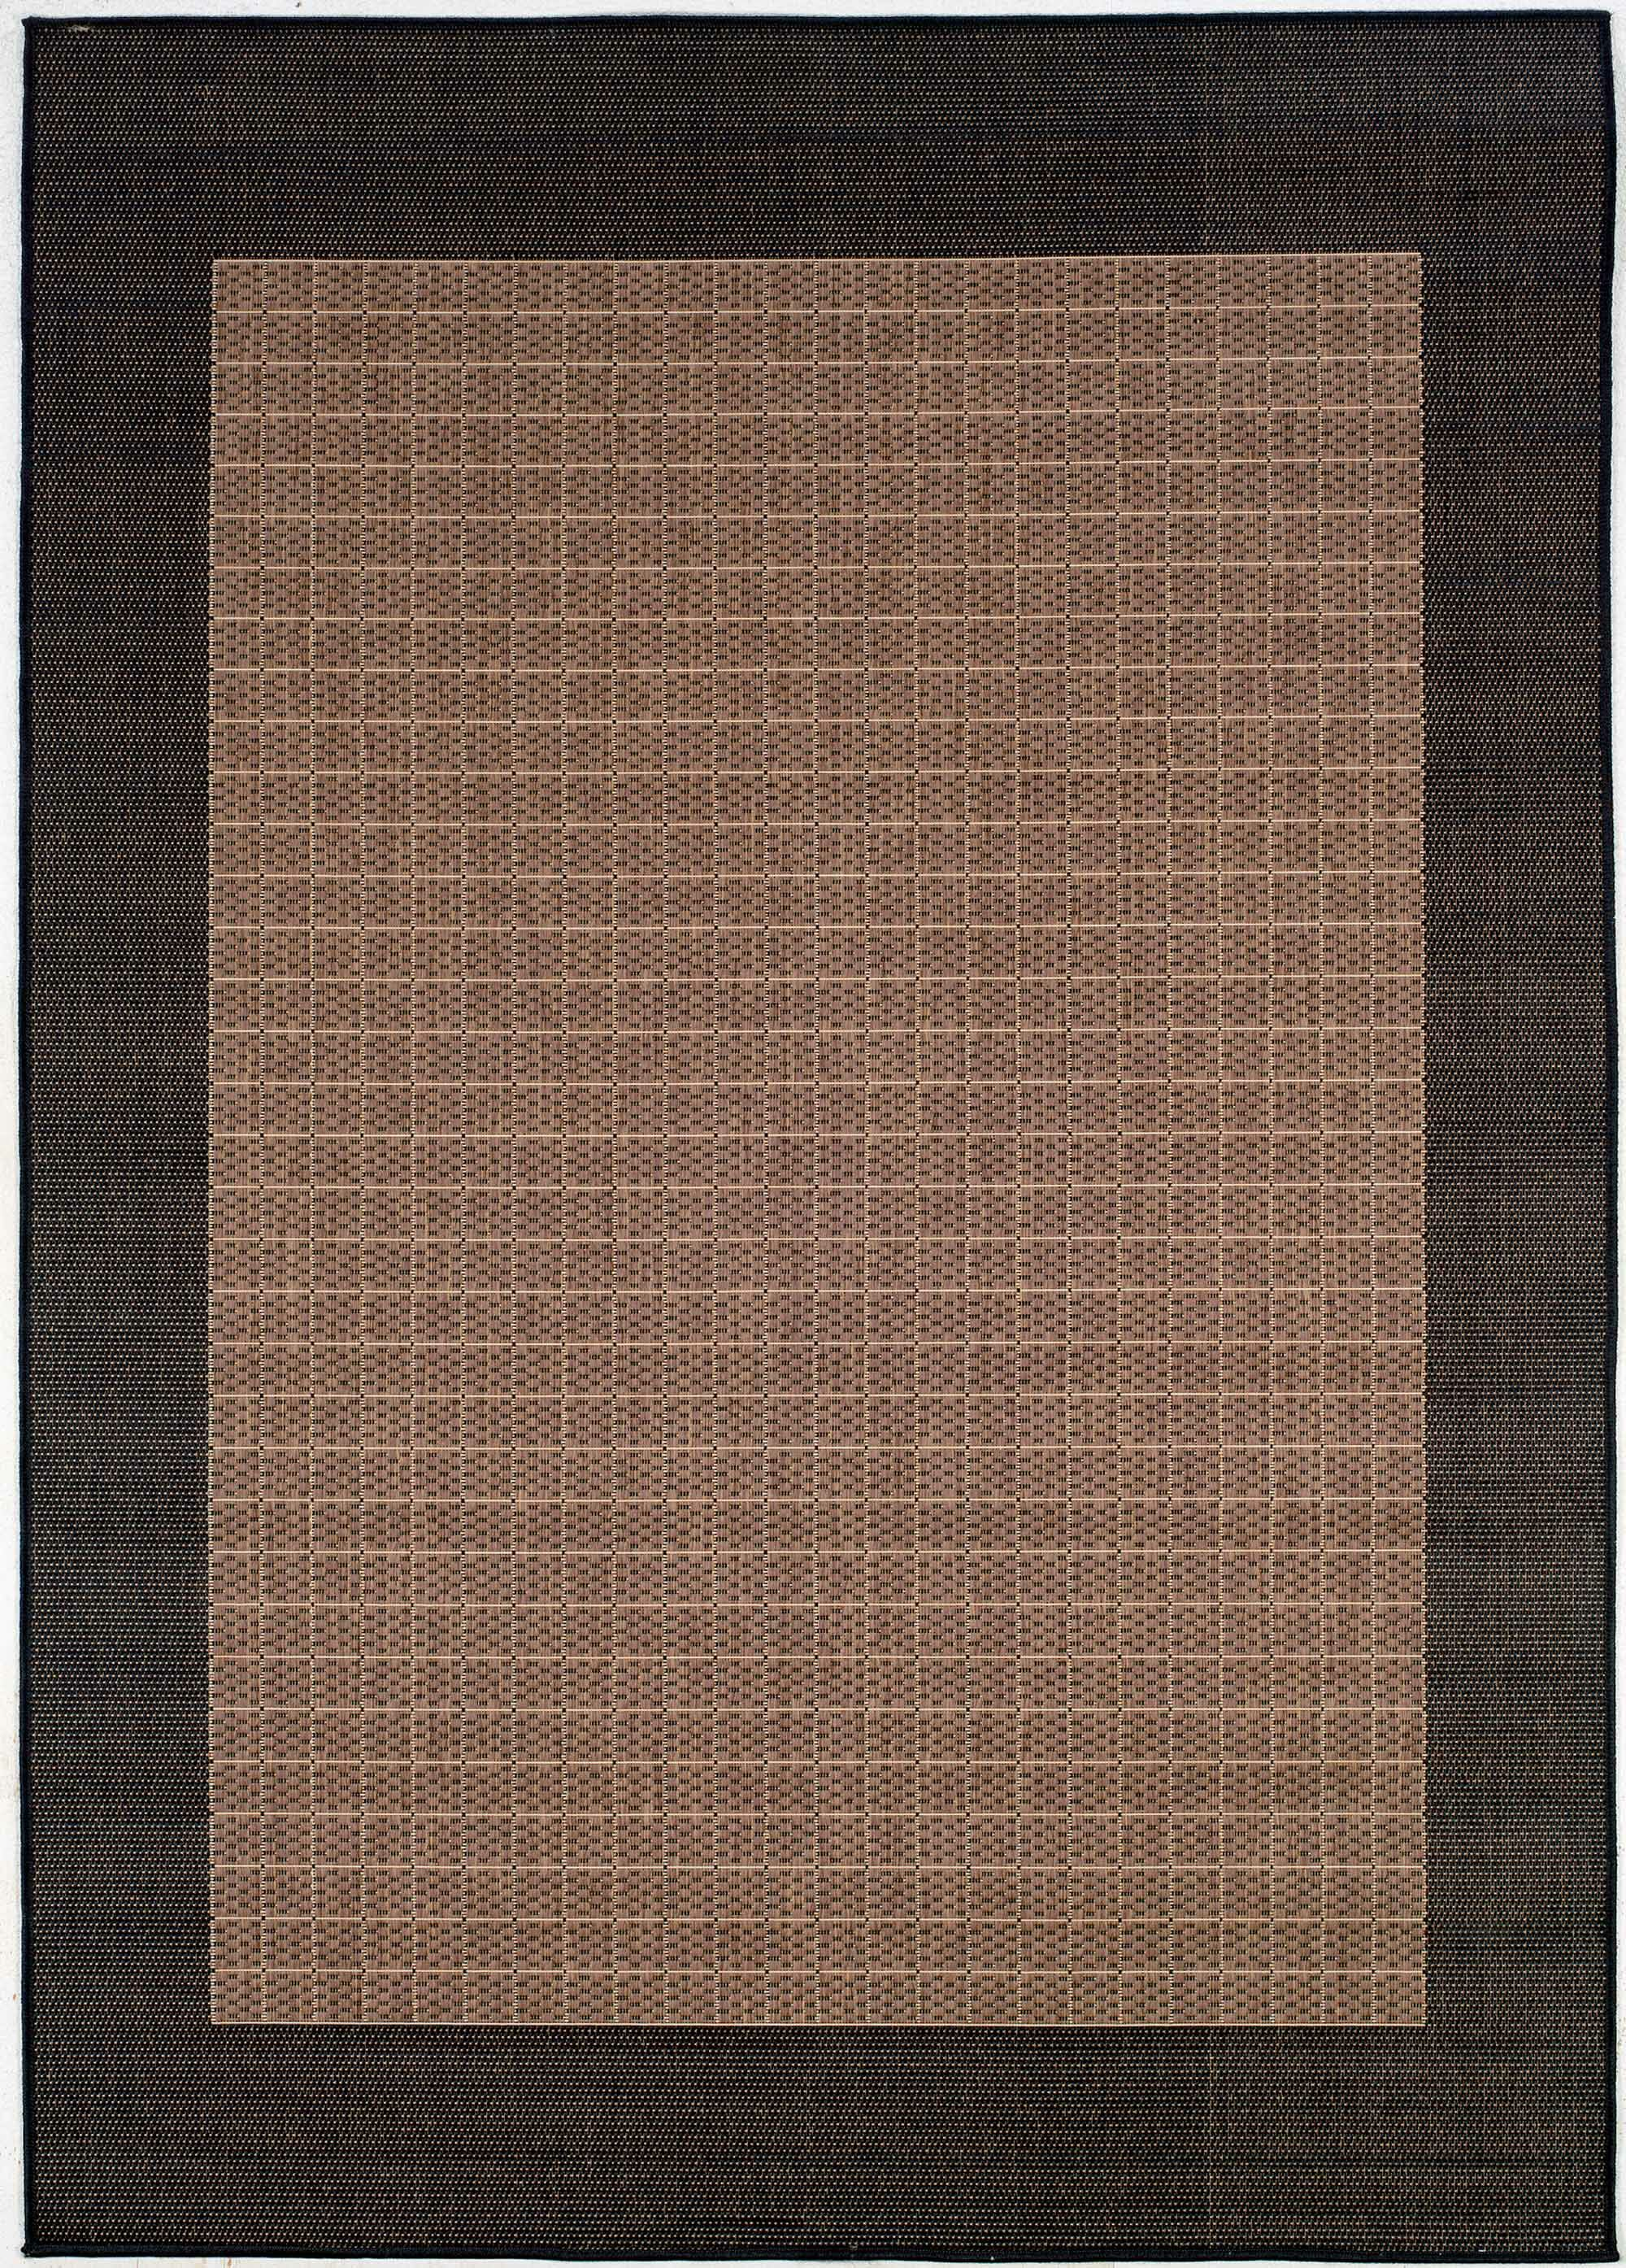 Halsey Checkered Field Cocoa/Black Indoor/Outdoor Area Rug Rug Size: Rectangle 5'10